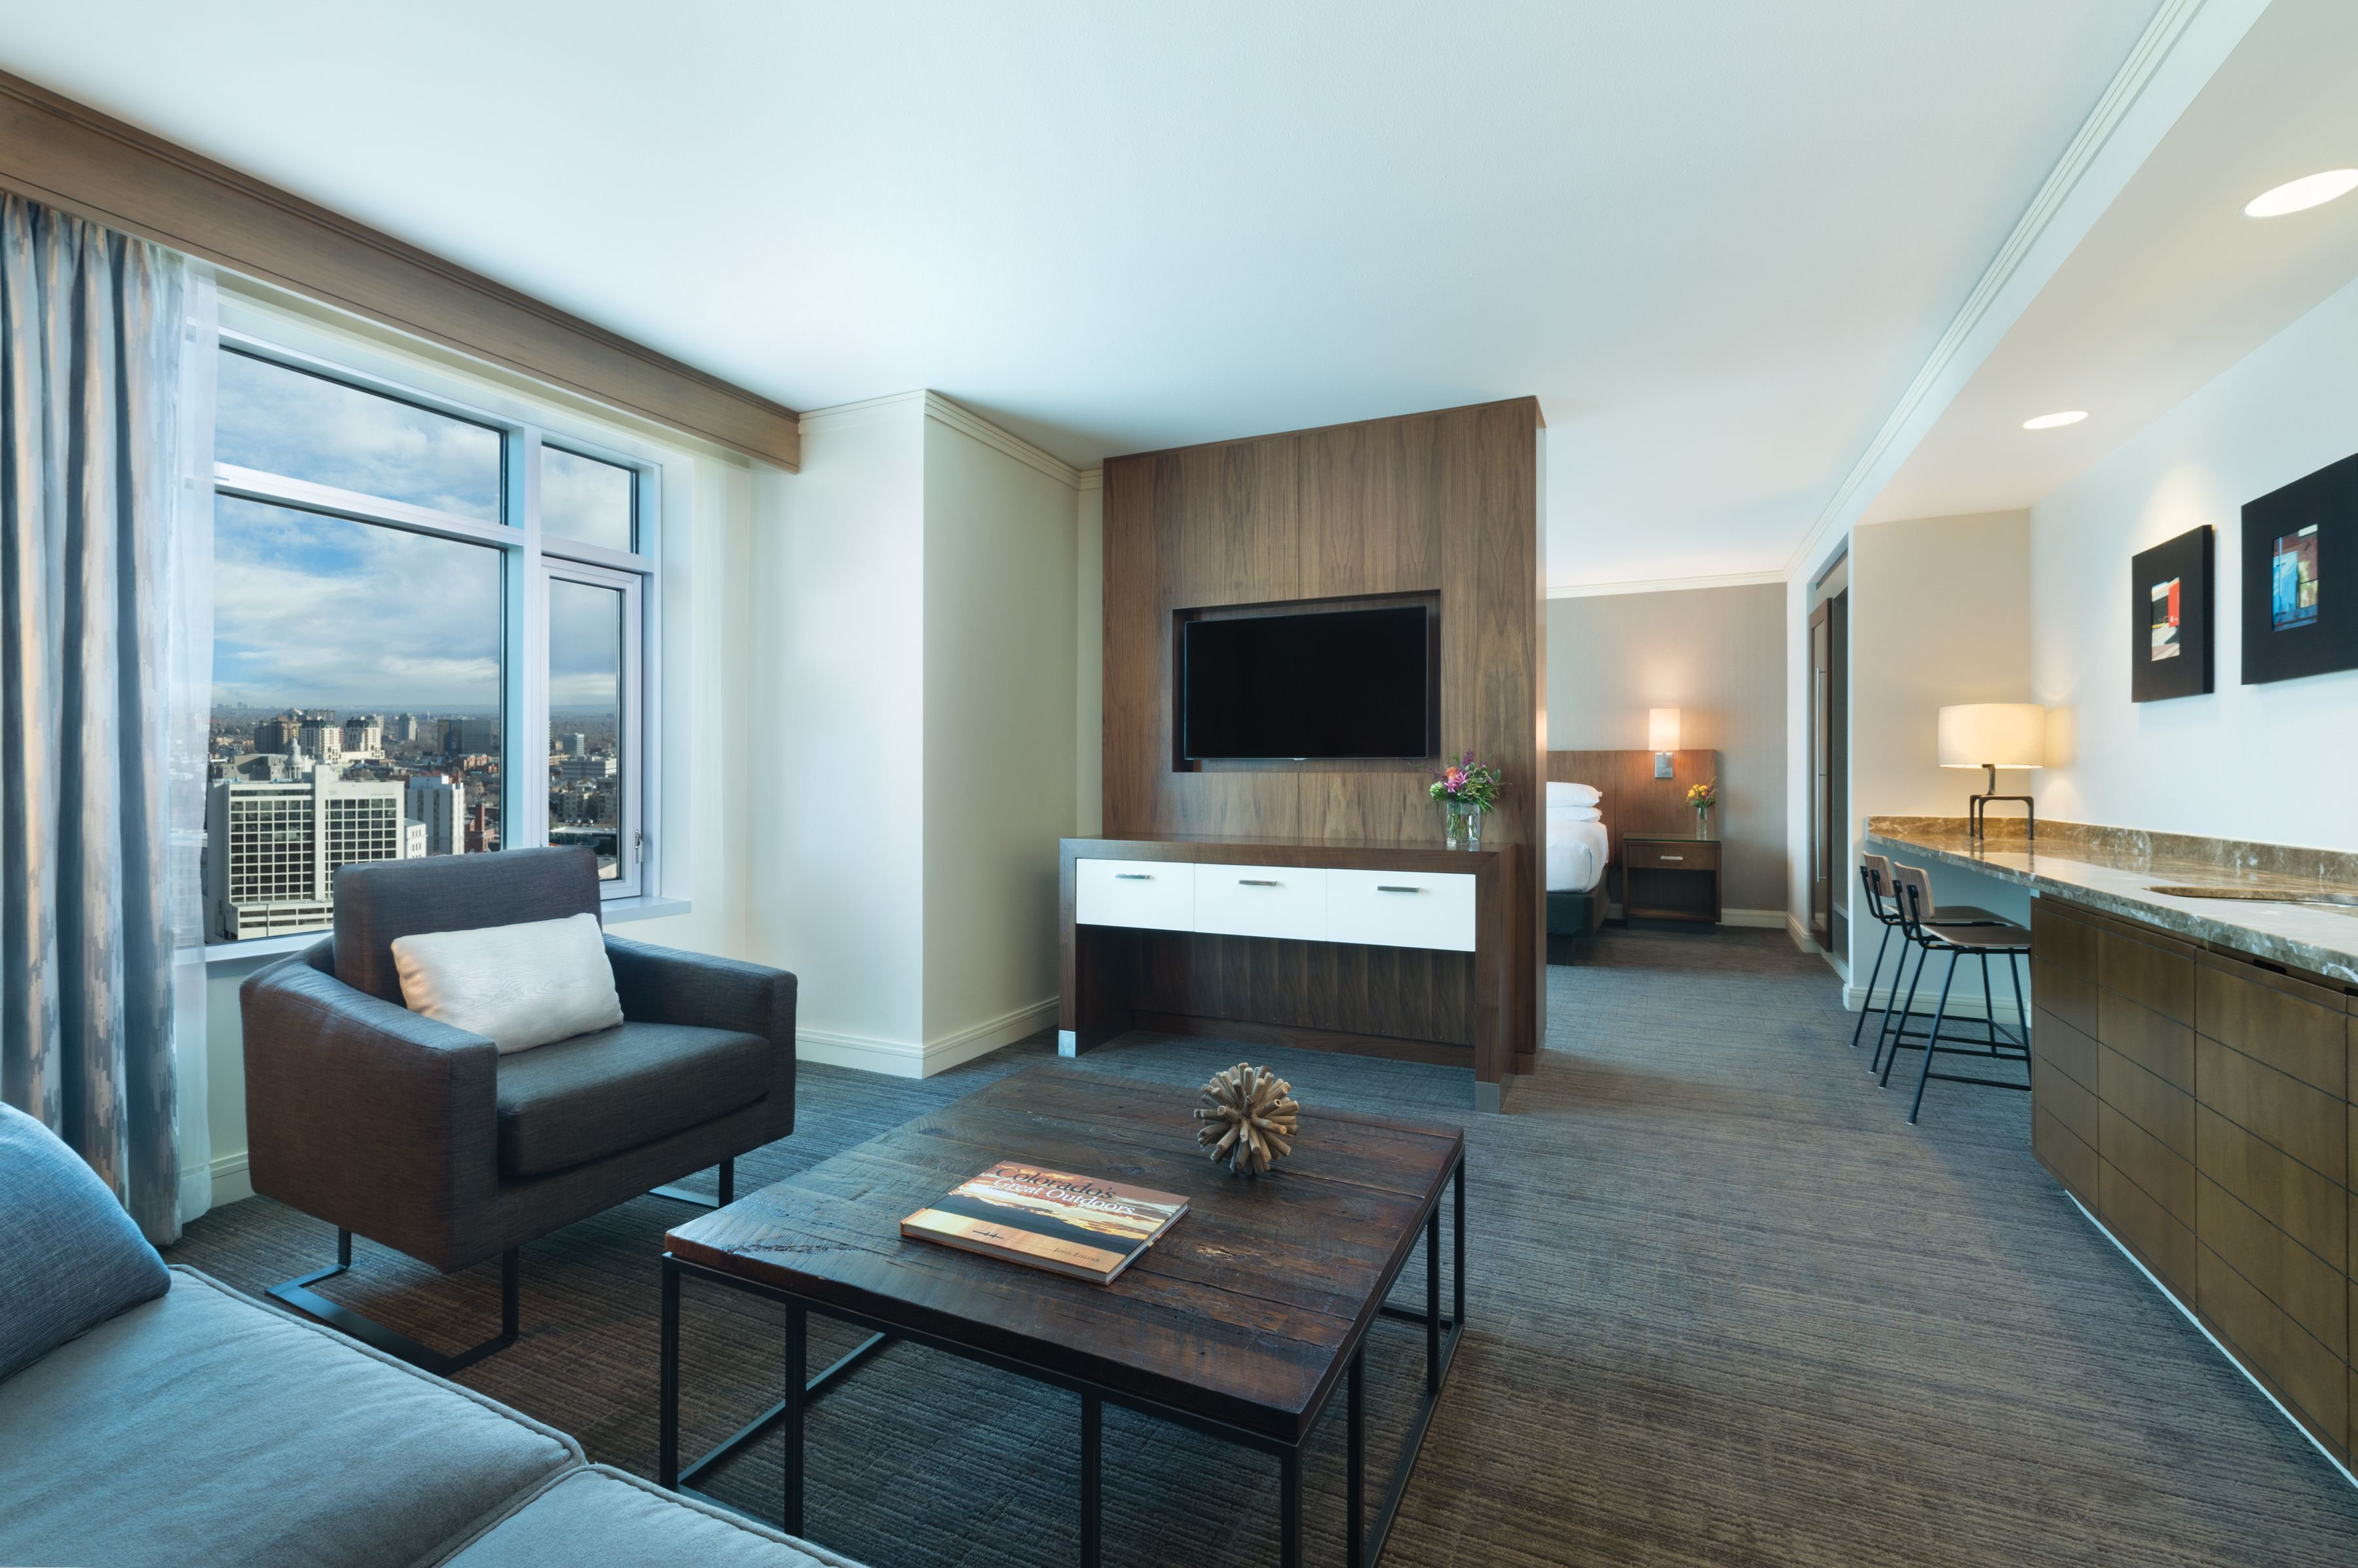 Colorado King Suite 565 Sq Ft Hyatt Regency Denver With